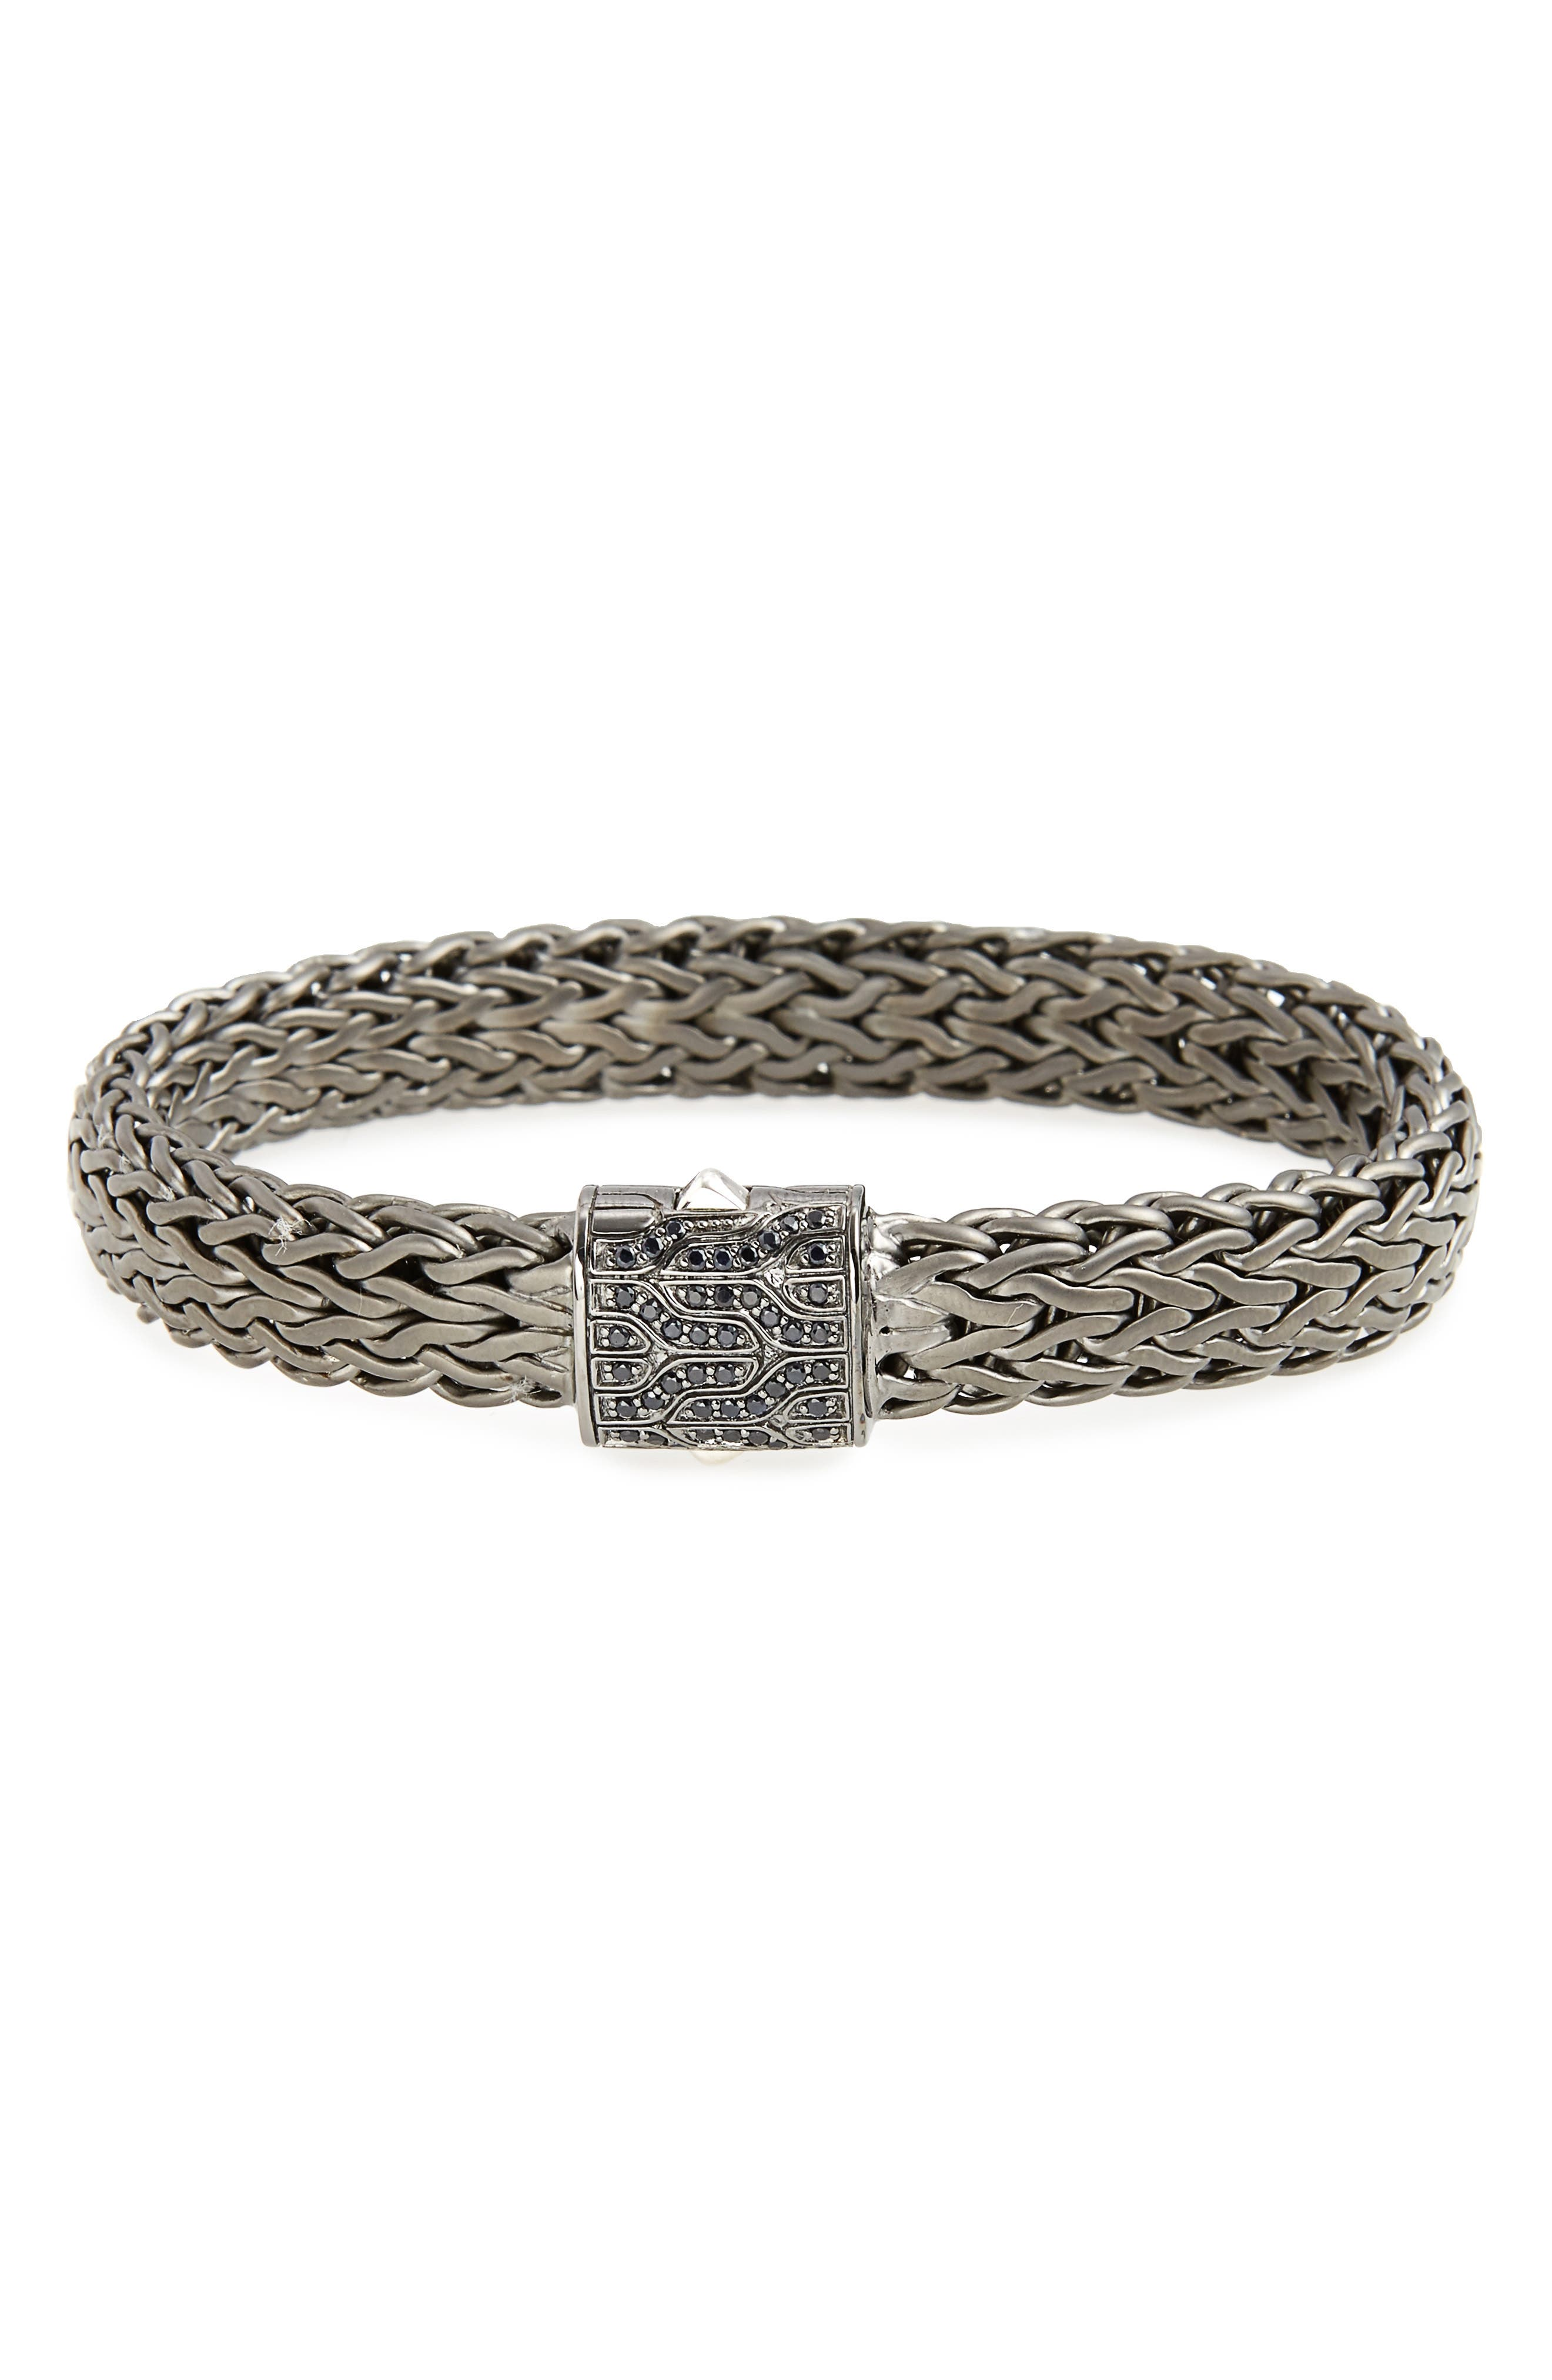 Main Image - John Hardy Men's Classic Chain Bracelet